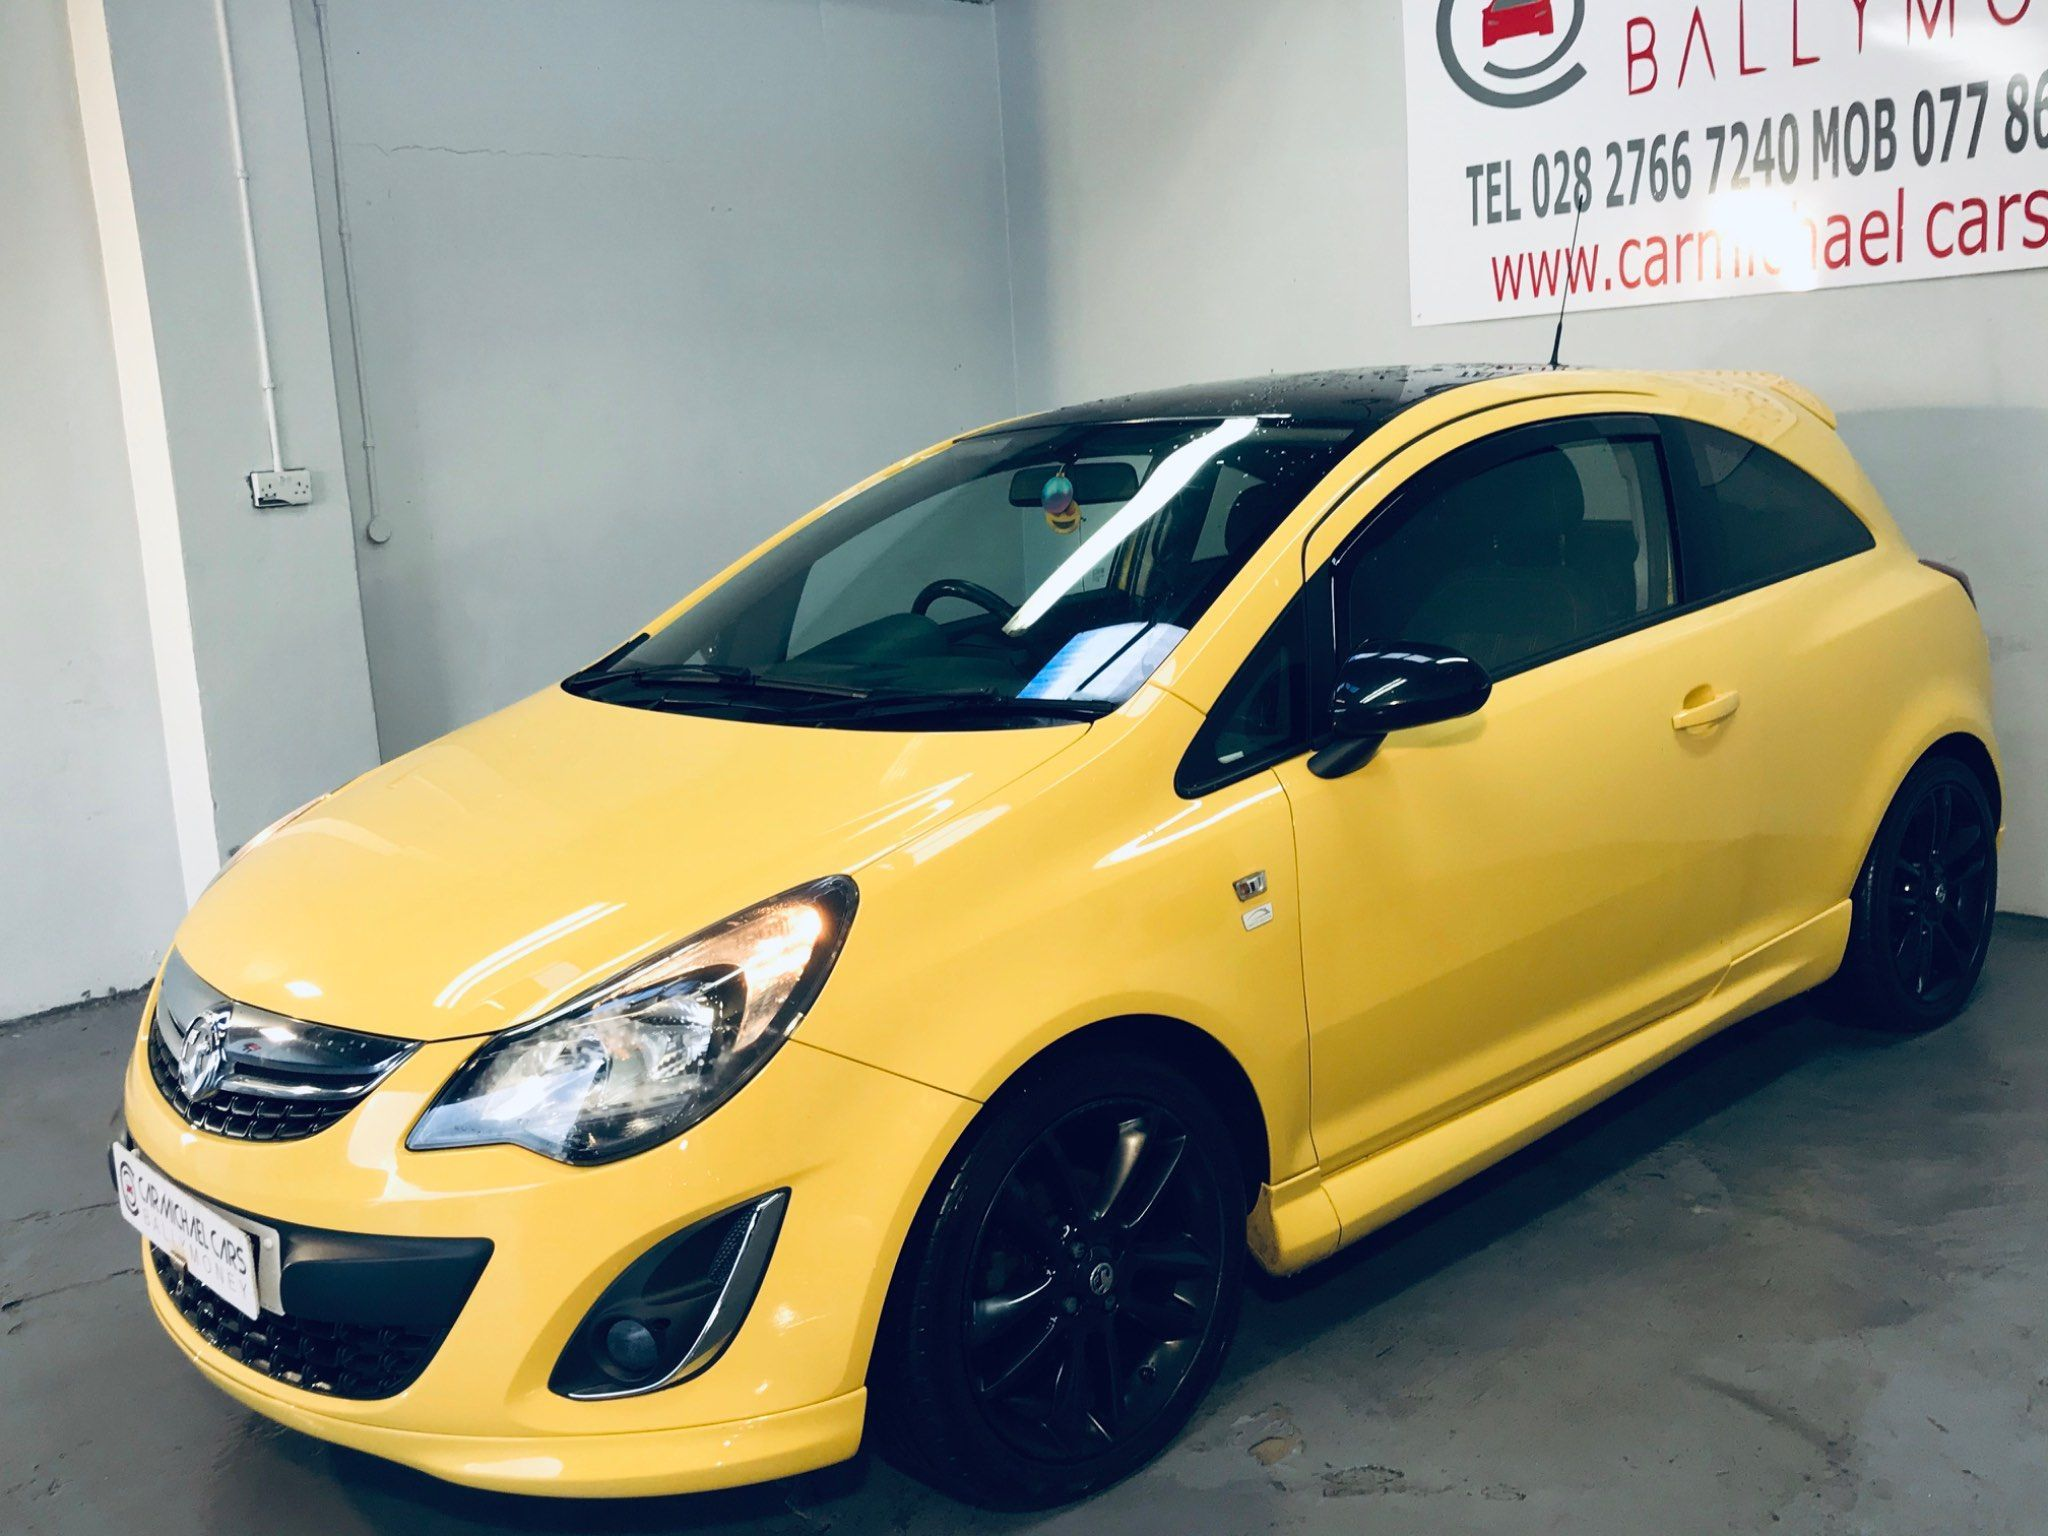 2013 VAUXHALL Corsa 1.2 i 16v Limited Edition  (a/c) Petrol Manual ONLY 54K, – Carmichael Cars Ballymoney full